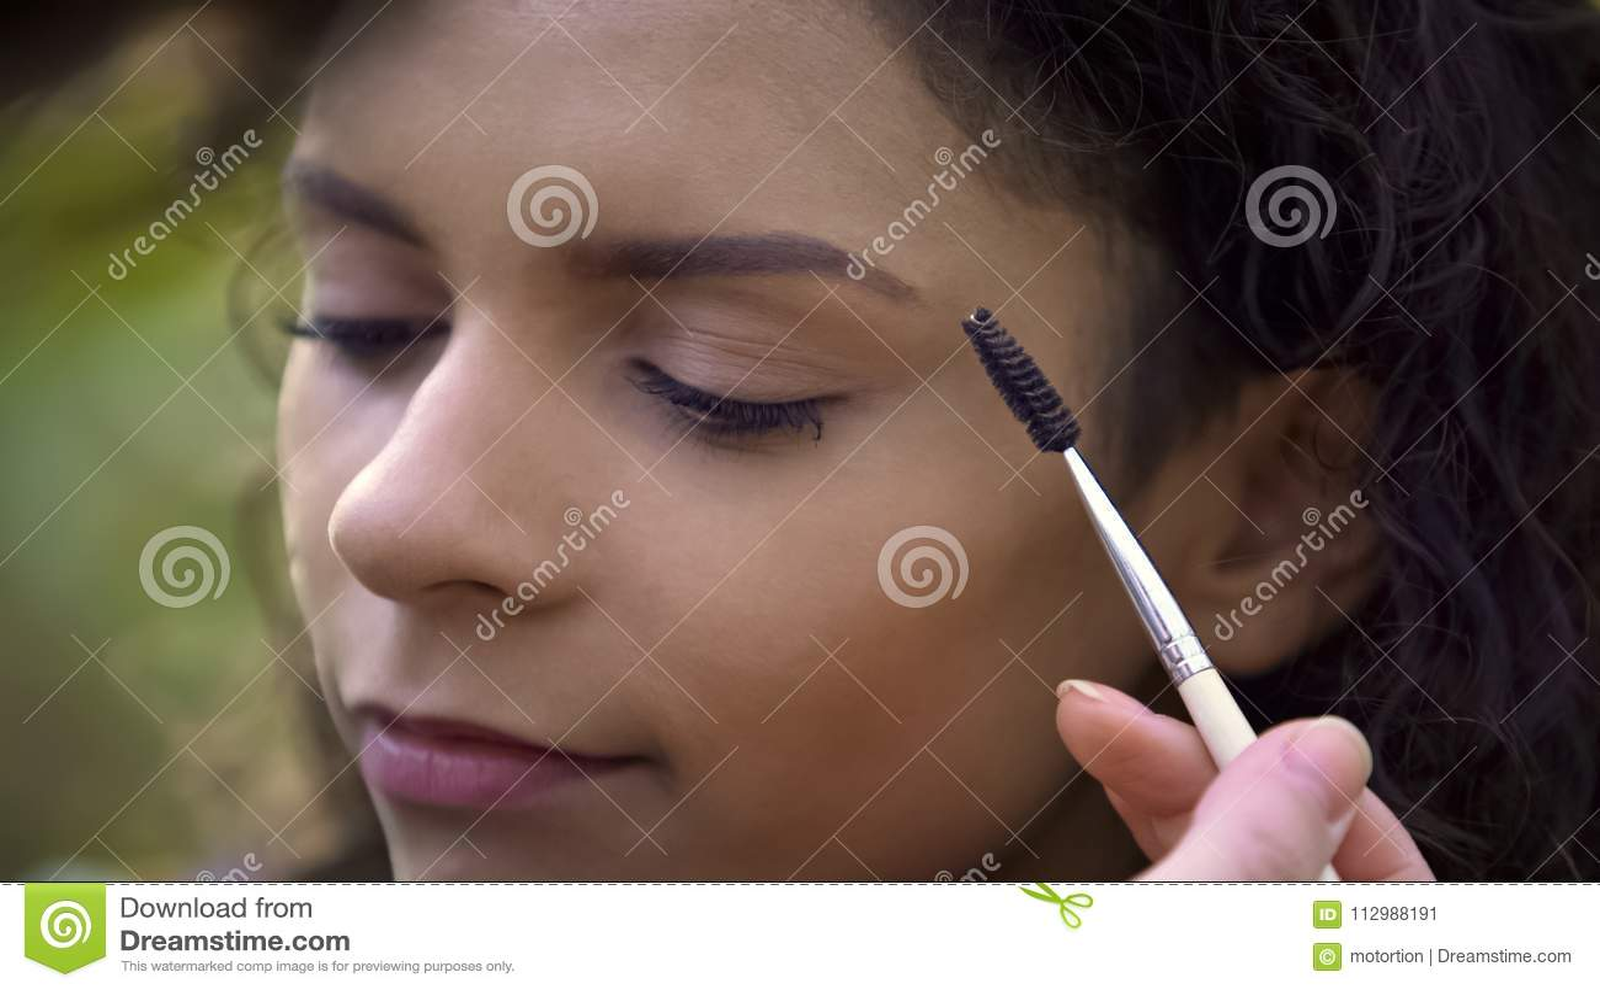 Makeup artist preparing beautiful young woman for shoot, enhancing eyebrows